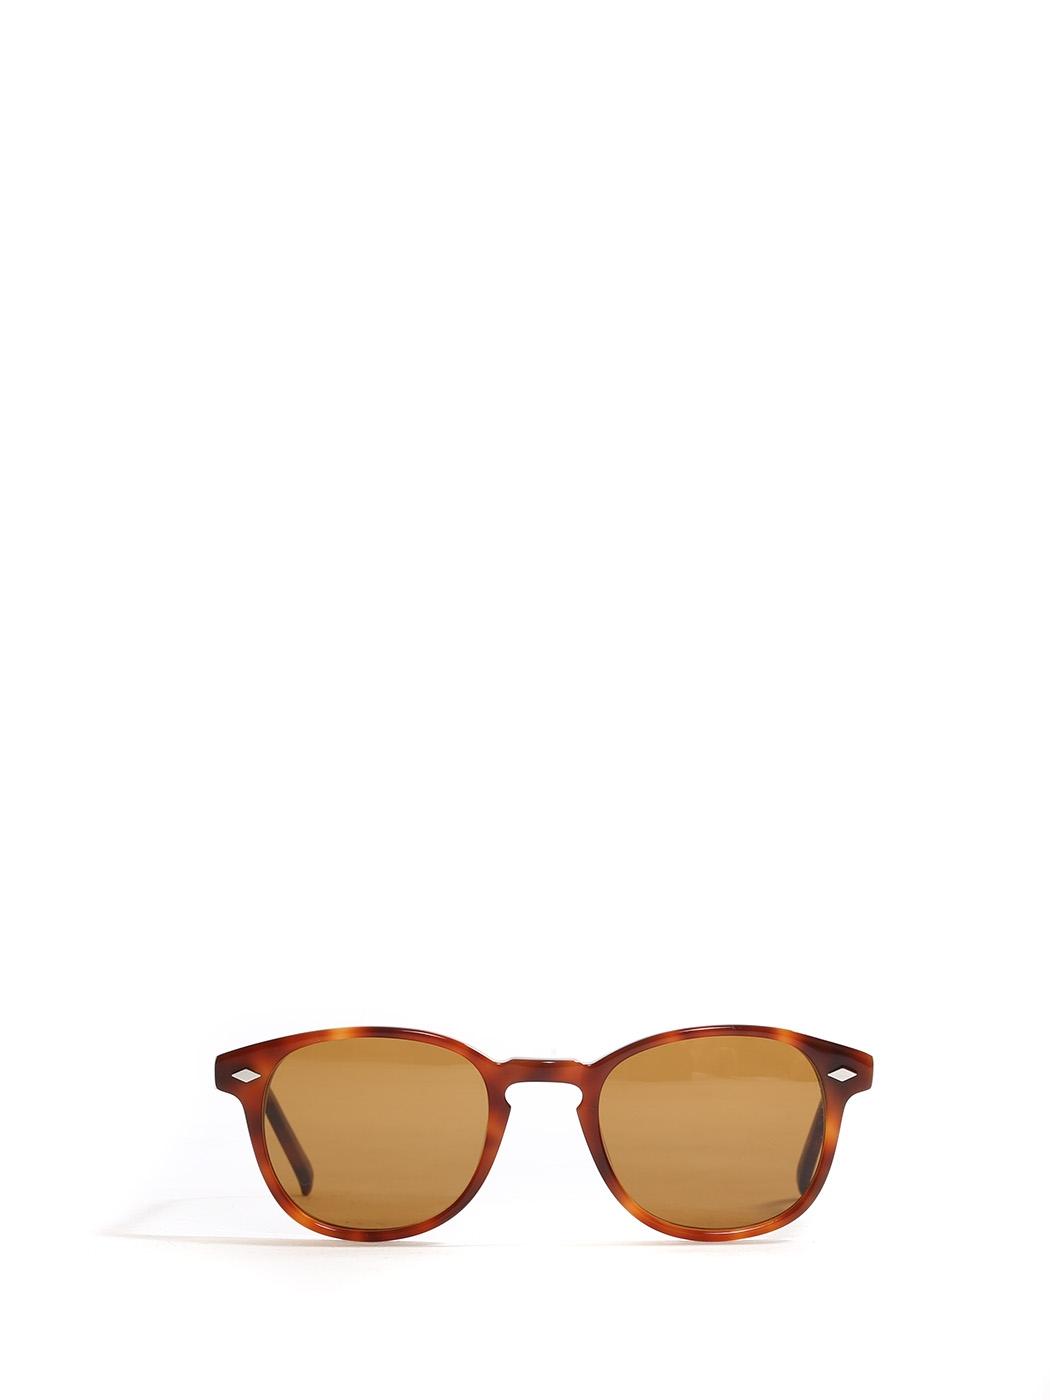 c229e6b3ff8 LA 711 camel tortoiseshell frame luxury sunglasses with brown lenses Retail  price €260 NEW